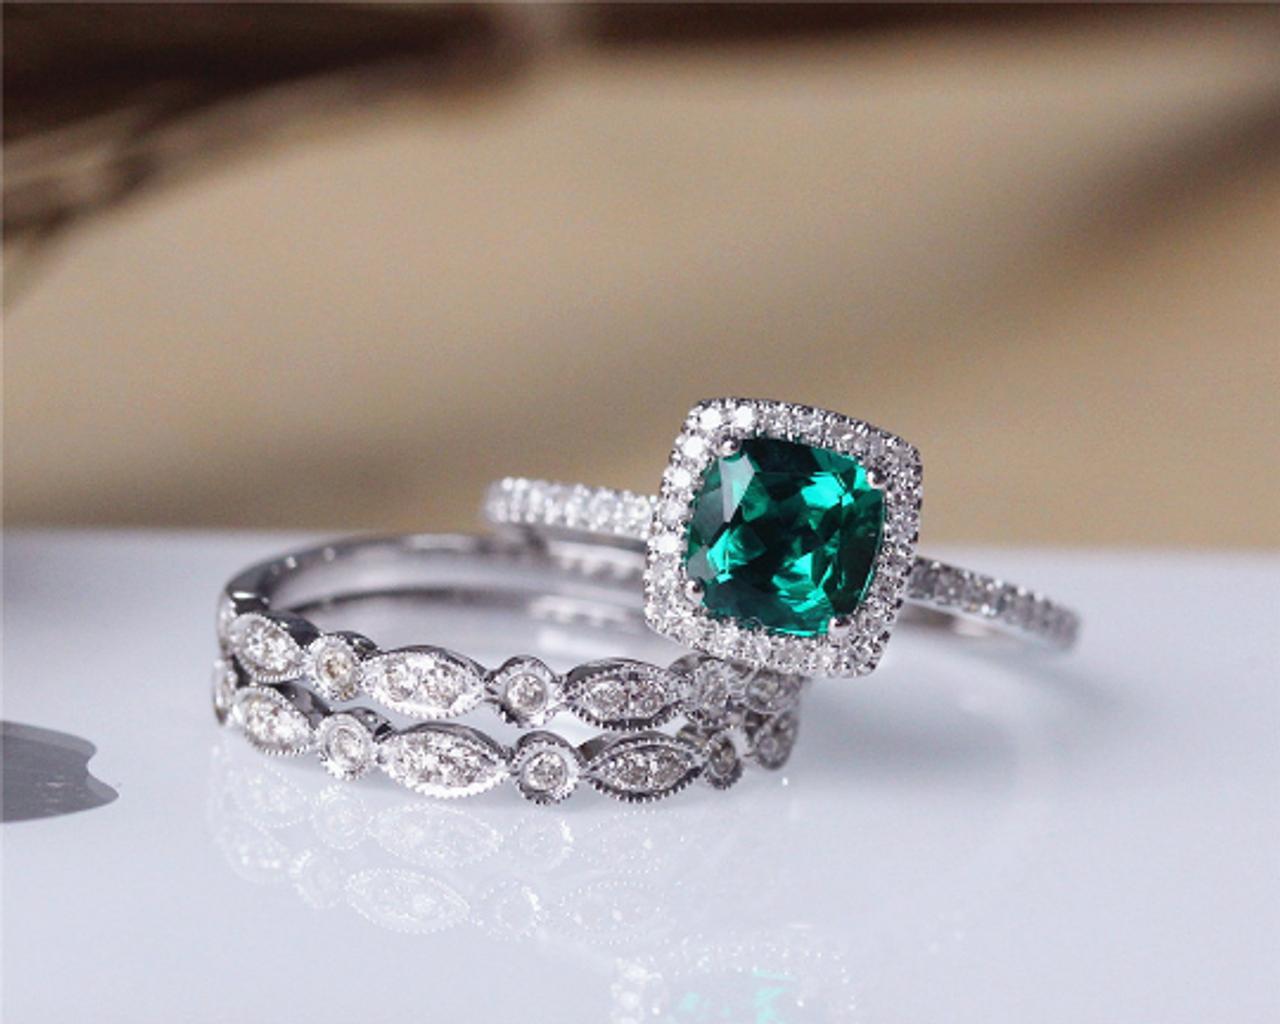 6mm Cushion Cut Emerald Ring Set Solid 14k White Gold Emerald Engagement Ring Set Wedding Ring Set